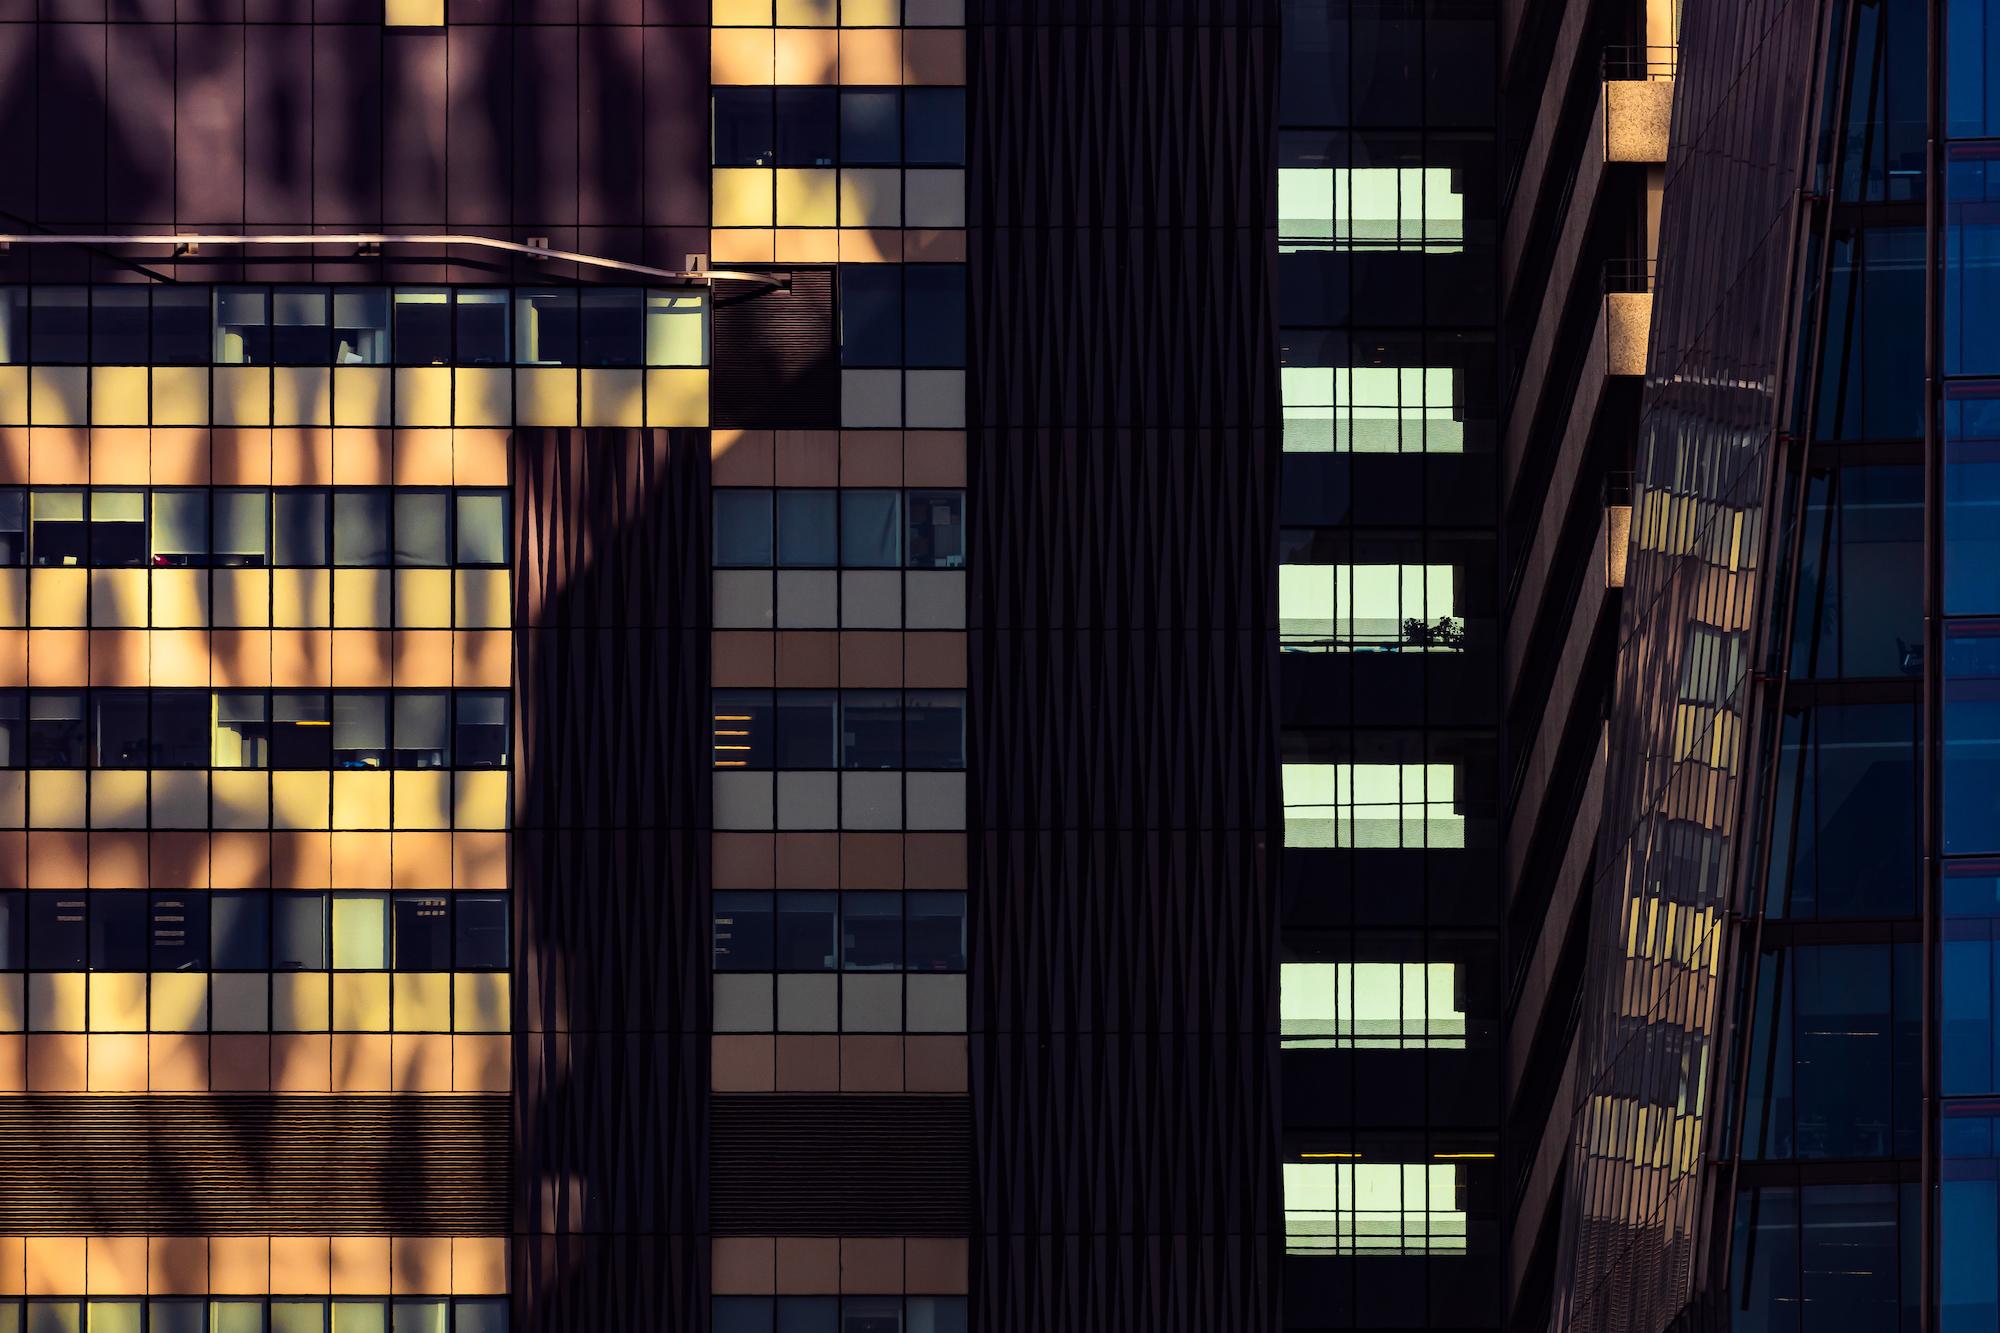 (203) Guy's Hospital, St Thomas Street, King's College London Guy's Campus and The Shard, The Shard of Glass, Shard London Bridge, Skyscraper, Southwark, 32 London Bridge Street, London, England. April 2019. Copyright David Wheater.jpg